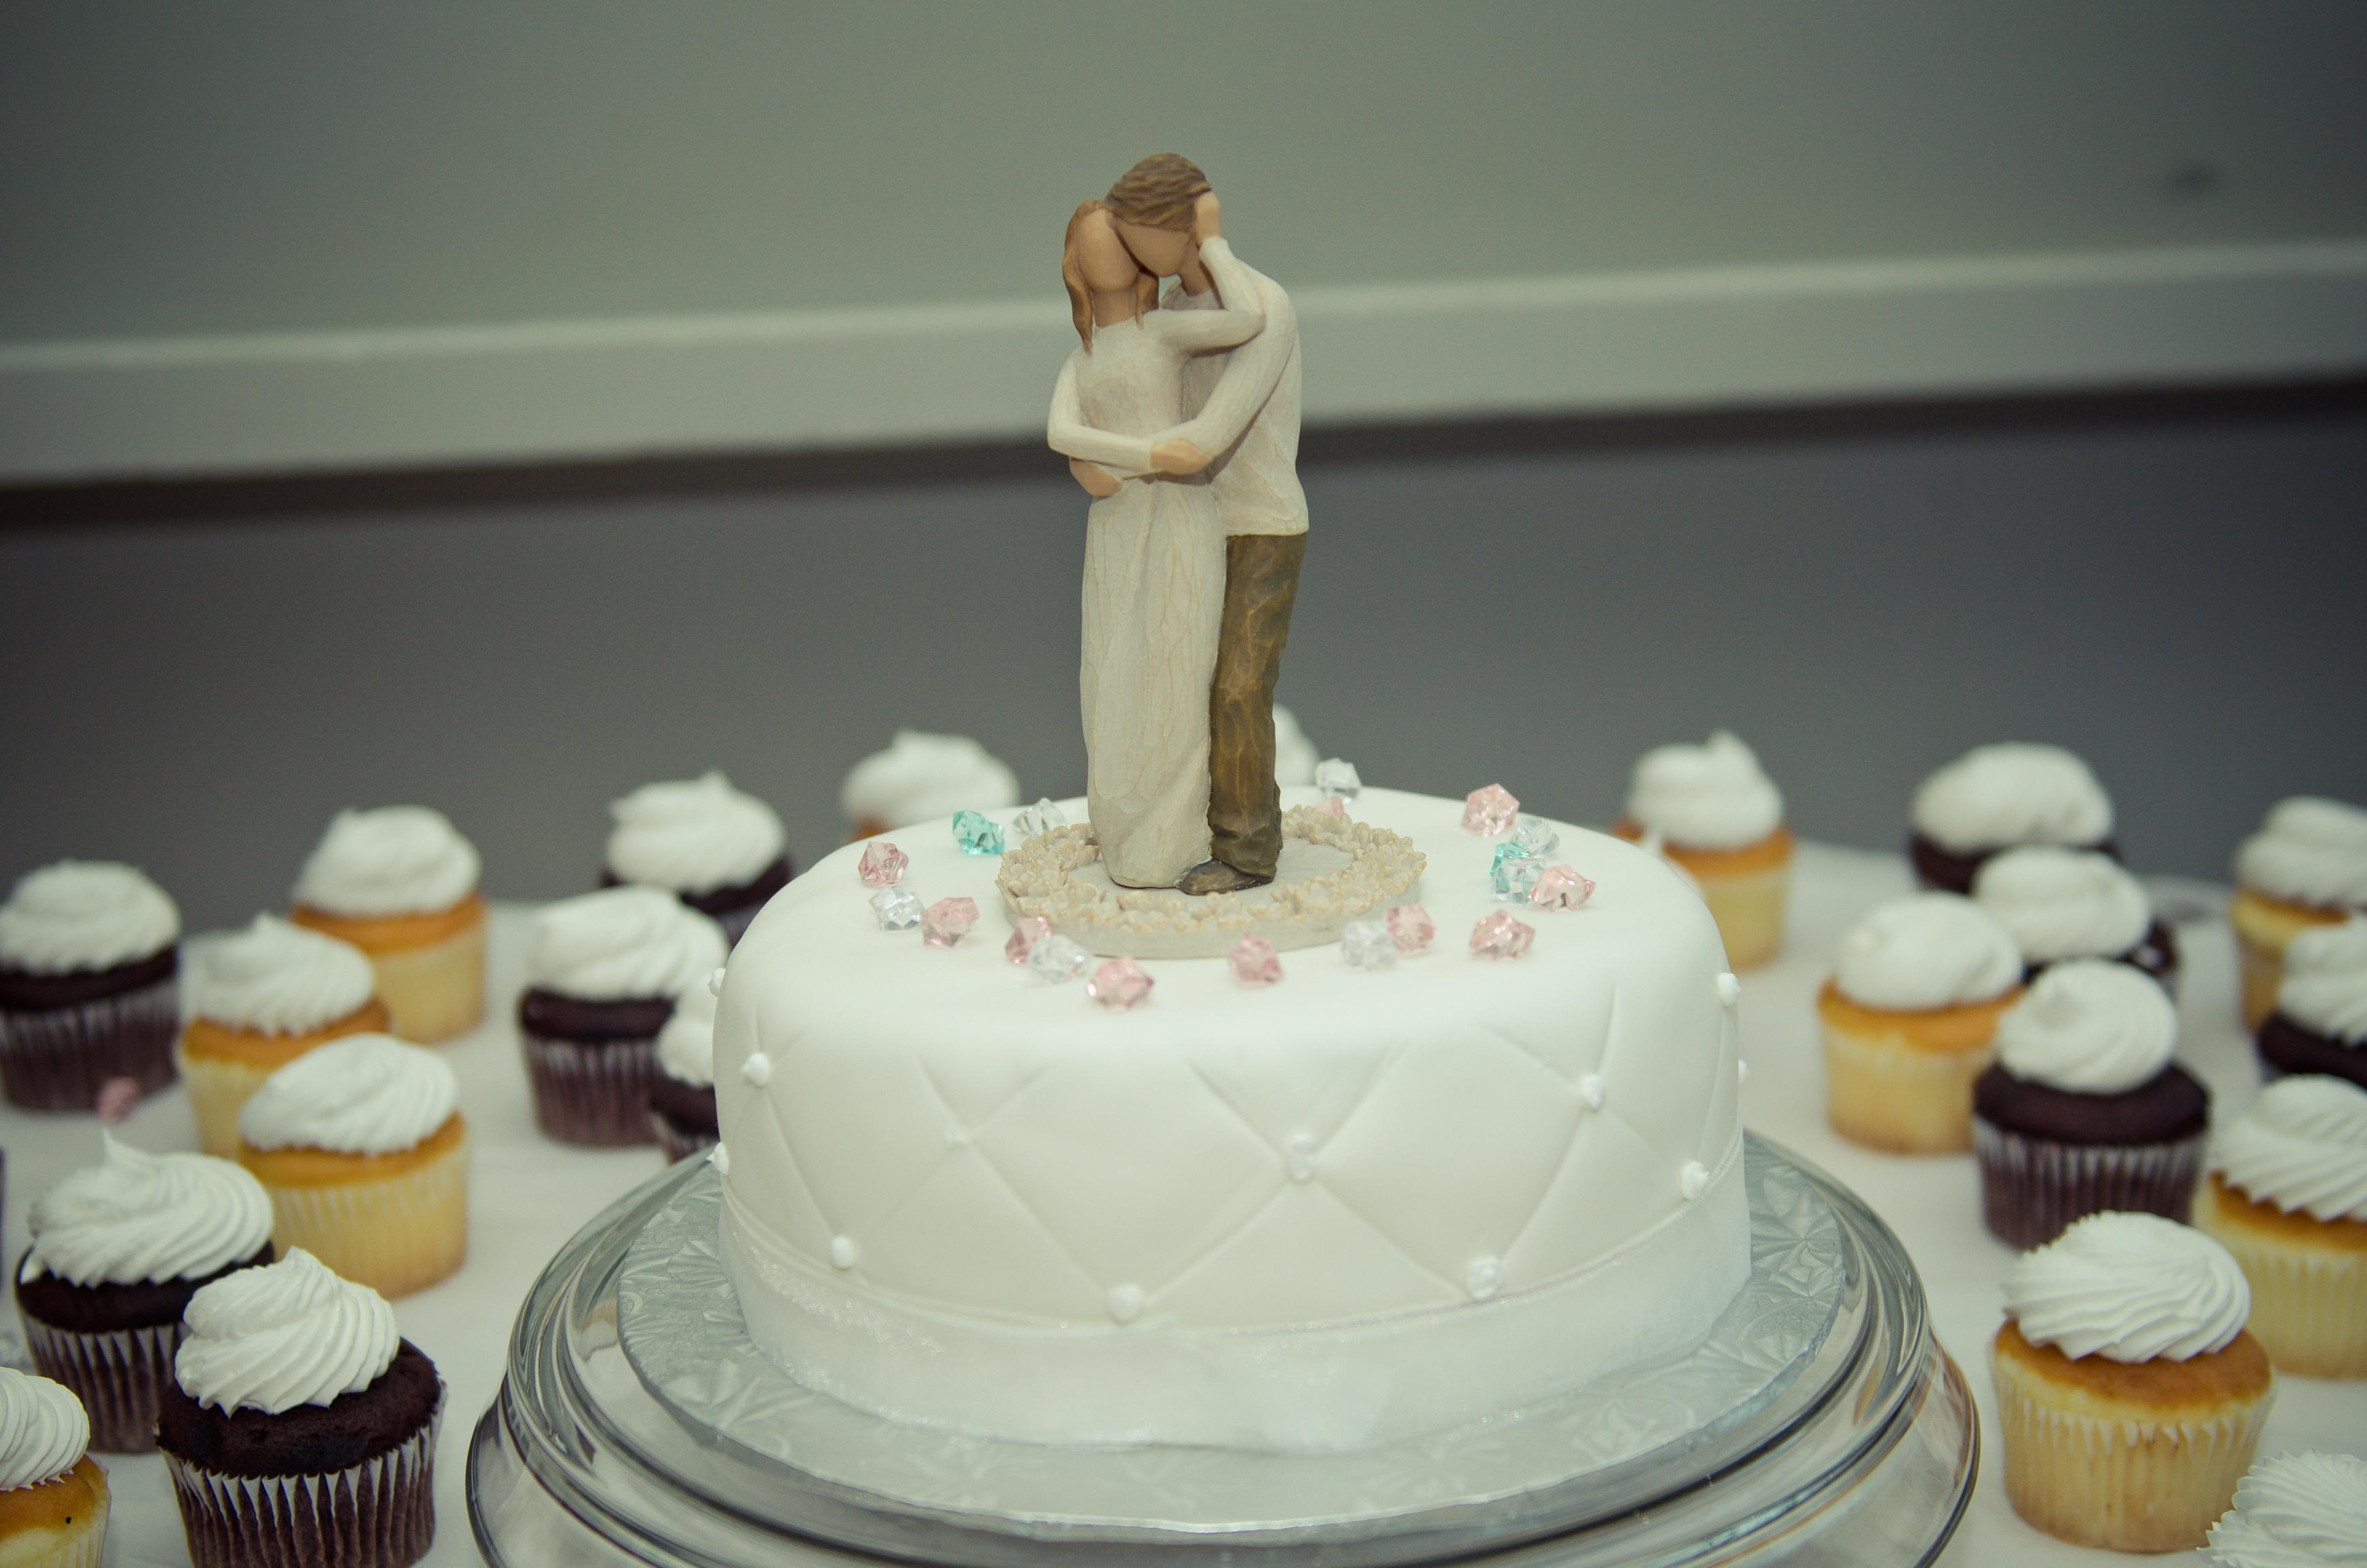 fotos gratis dulce comida postre boda formacin de hielo fondant sombrero de copa dulzura pastel de boda torta pasta de azcar